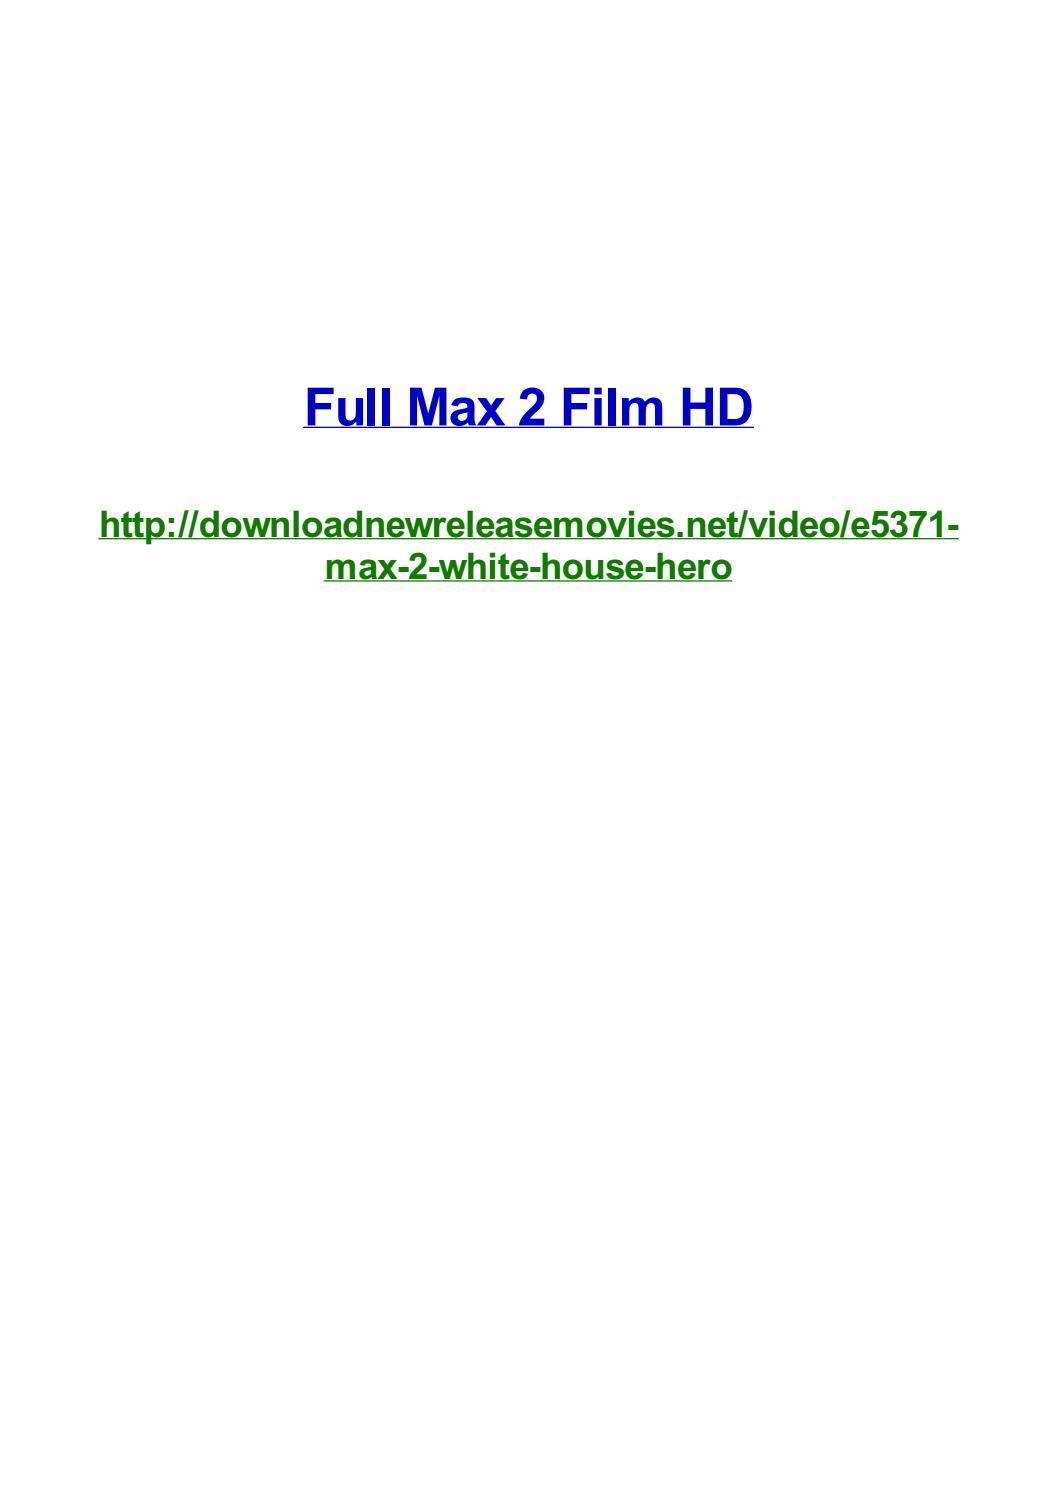 Full Max 2 Film Hd By Frank Seamons Issuu